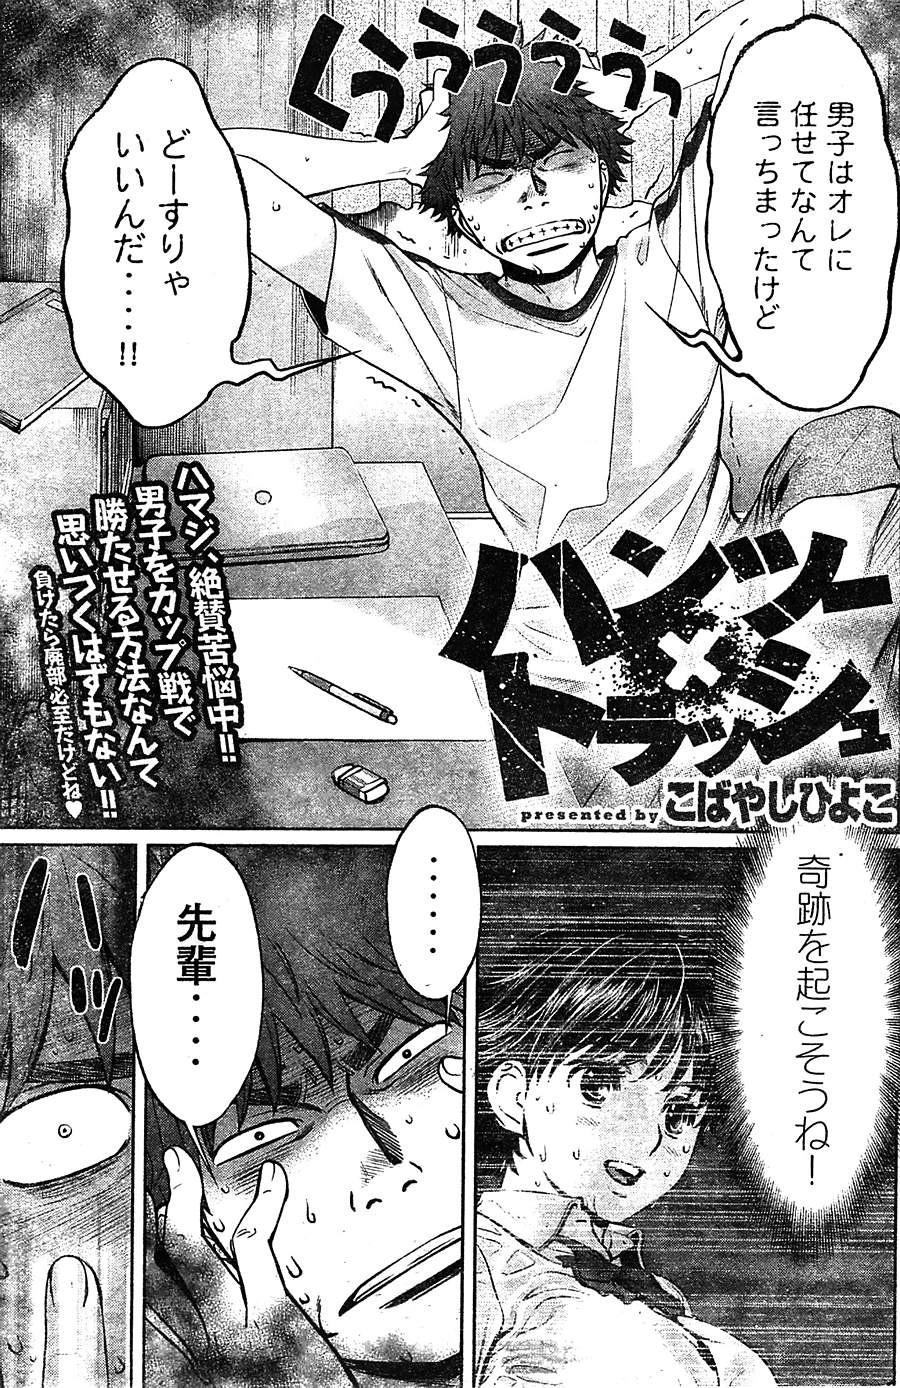 Hantsu x Trash - Chapter 93 - Page 1